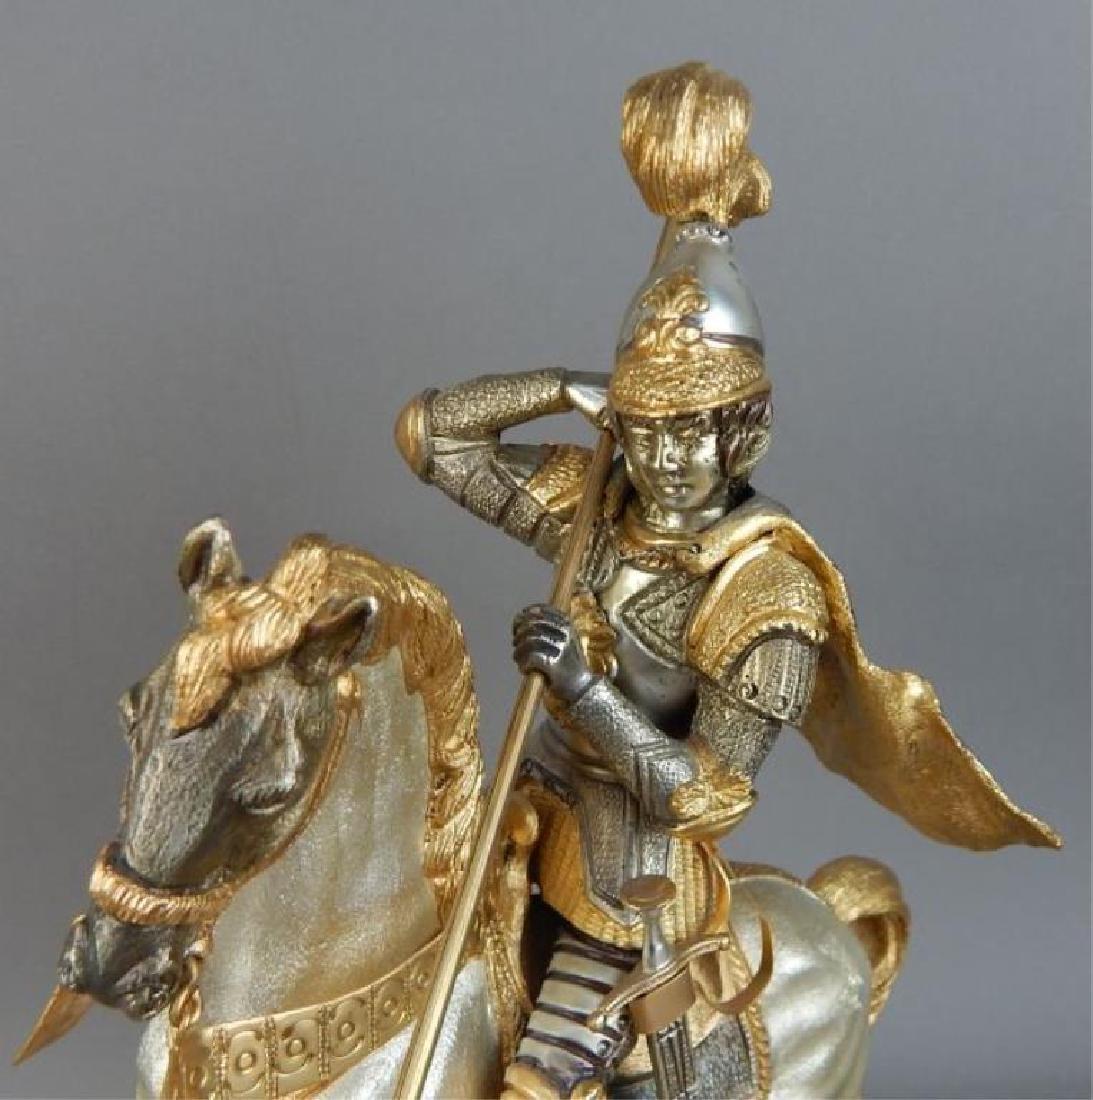 Piero Benzoni Silver & Gold Over Bronze Sclupture - 3